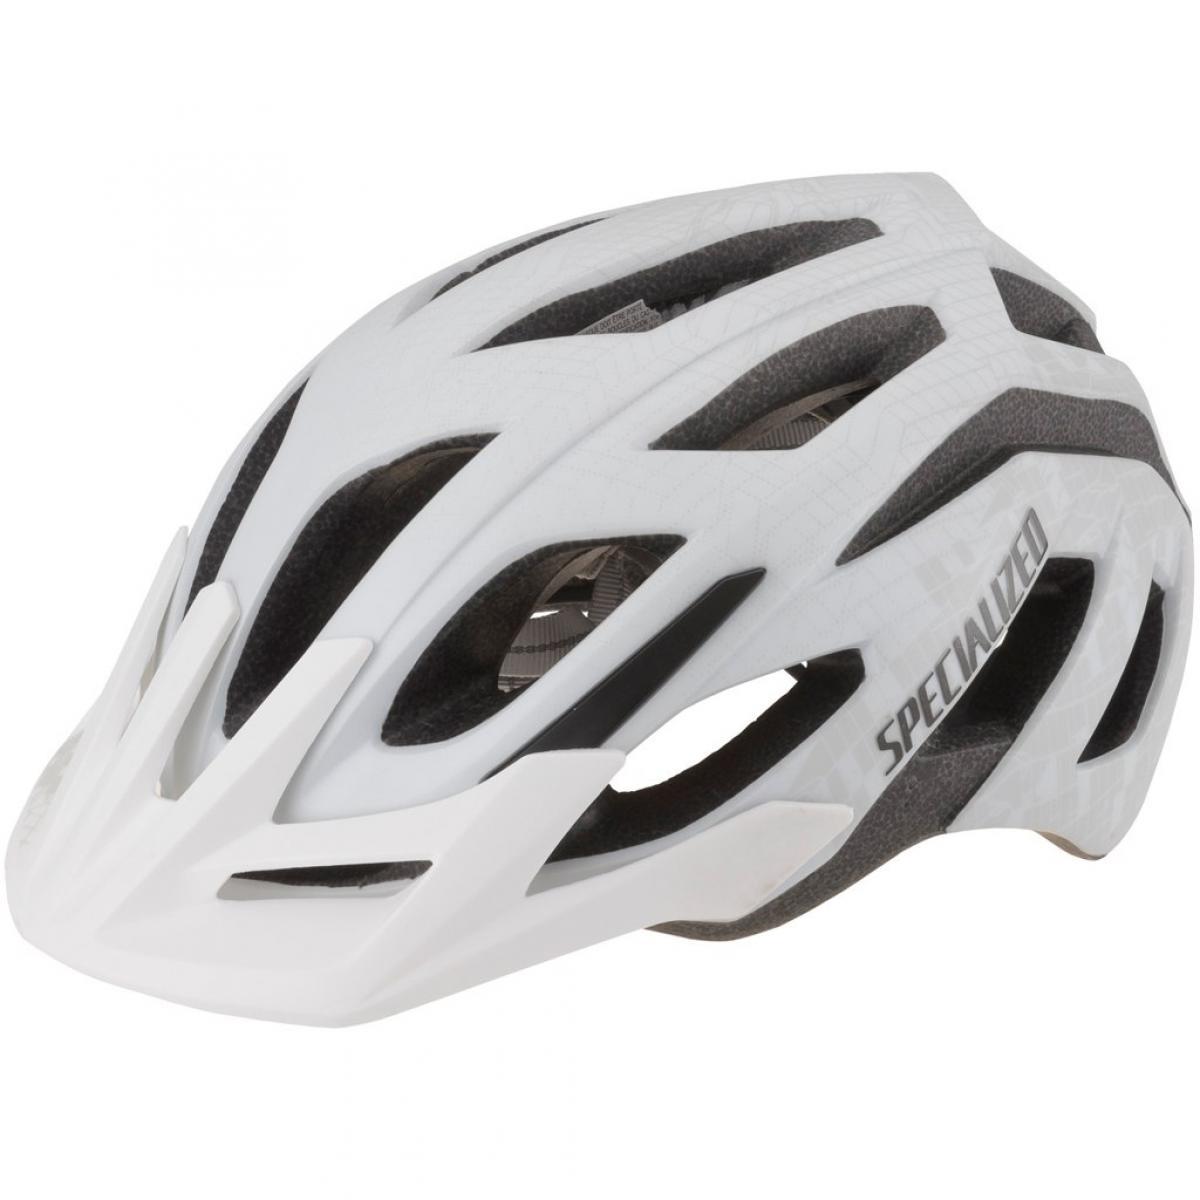 Specialized Tactic Ii Helmet Reviews Mountain Bike